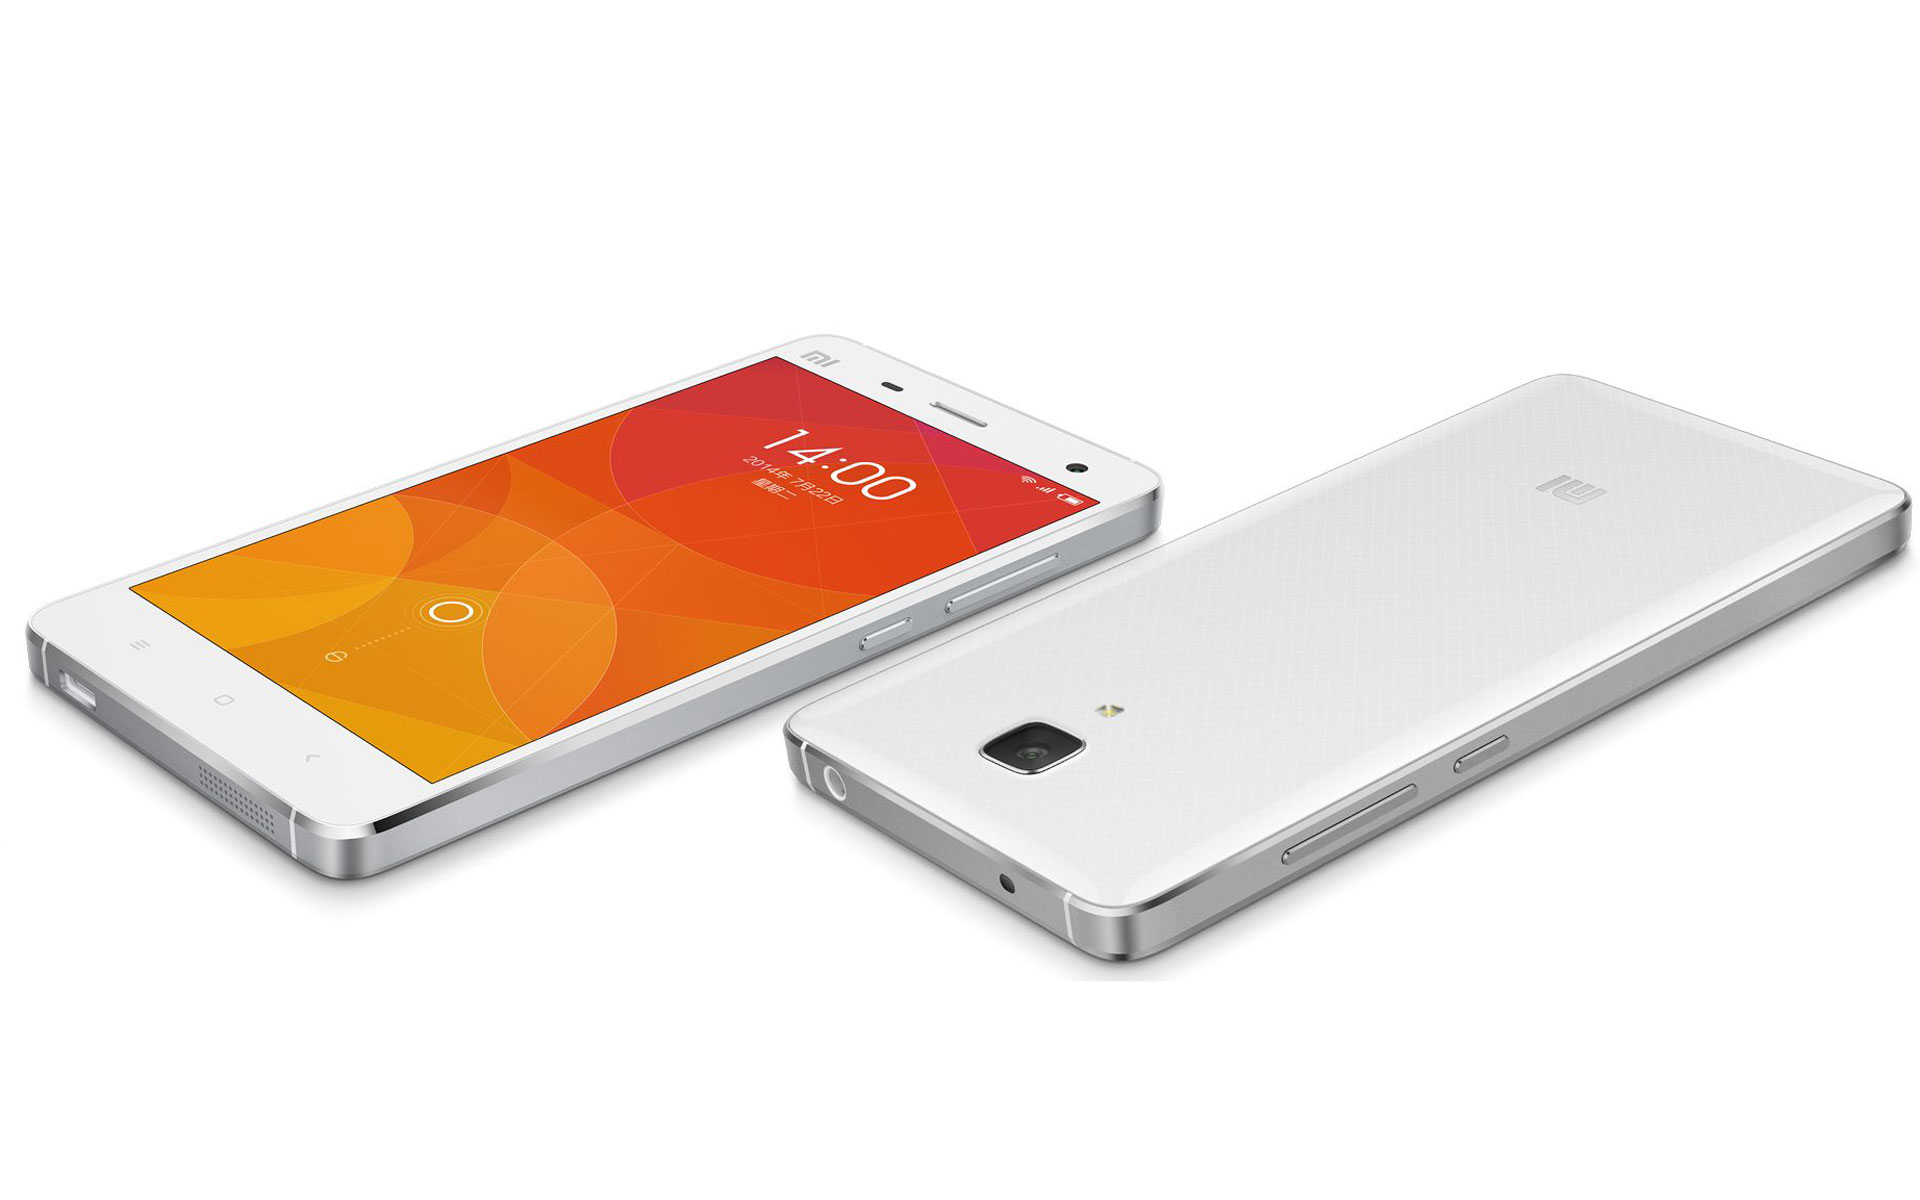 Xiaomi Mi4 Review from Gearbest 2